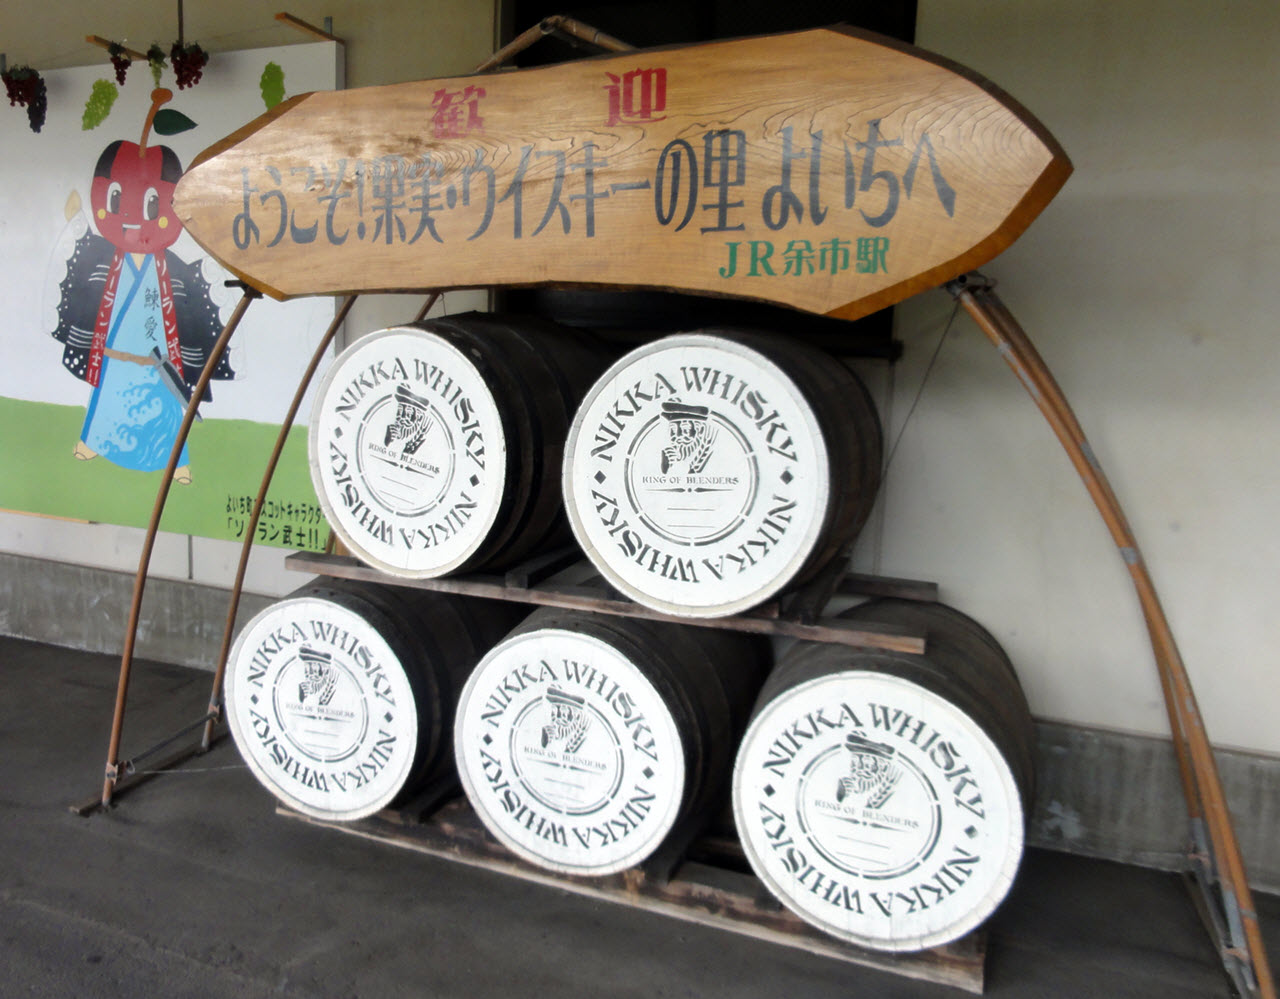 Yoichi Distillery - the train station